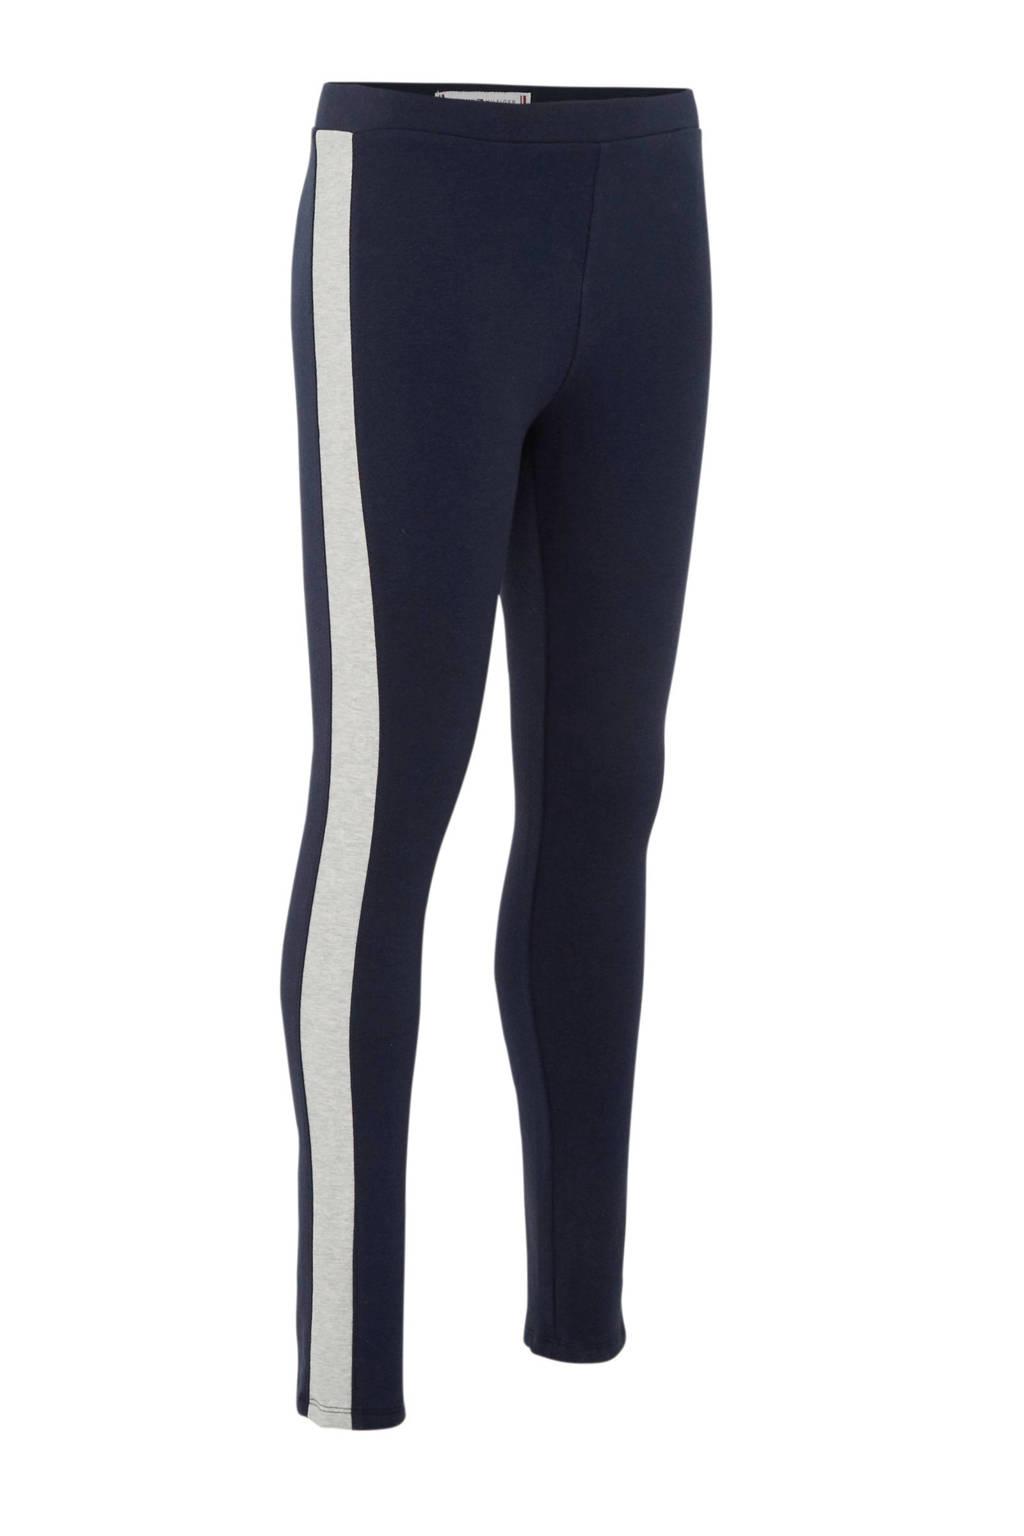 Tommy Hilfiger joggingbroek, Donkerblauw